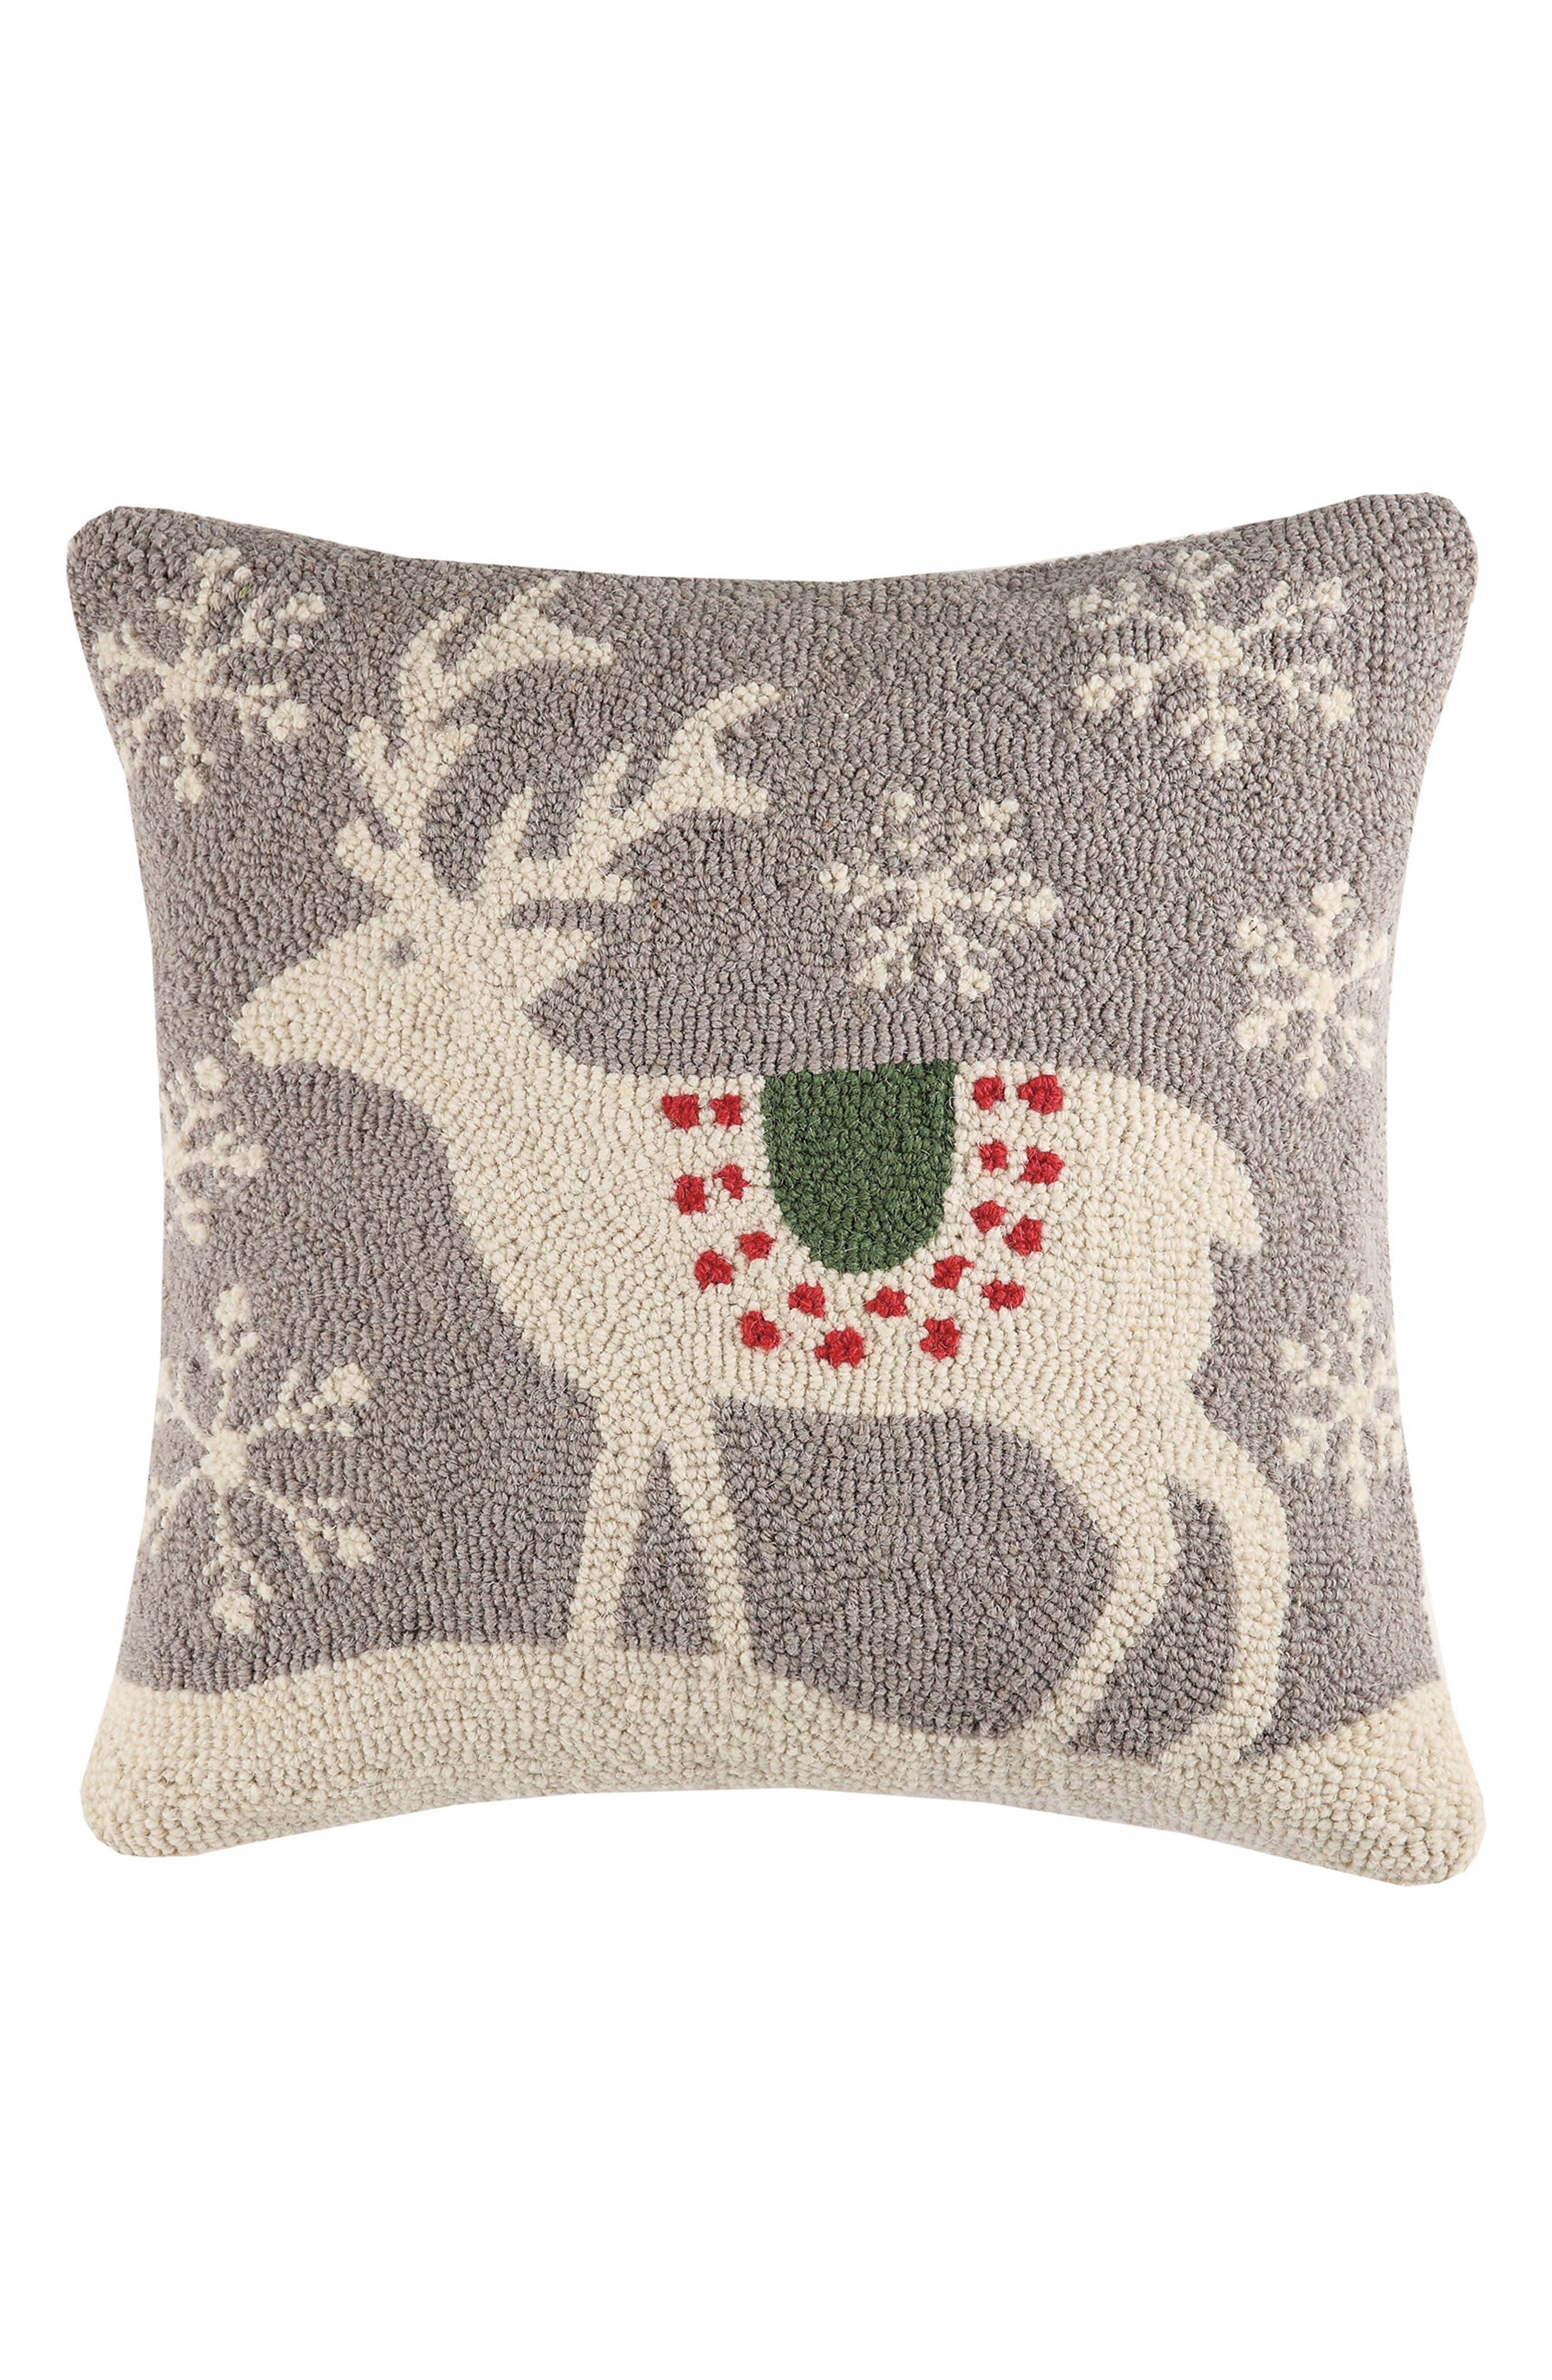 Scandinavian Reindeer Hooked Accent Pillow,                             Main thumbnail 1, color,                             GREY